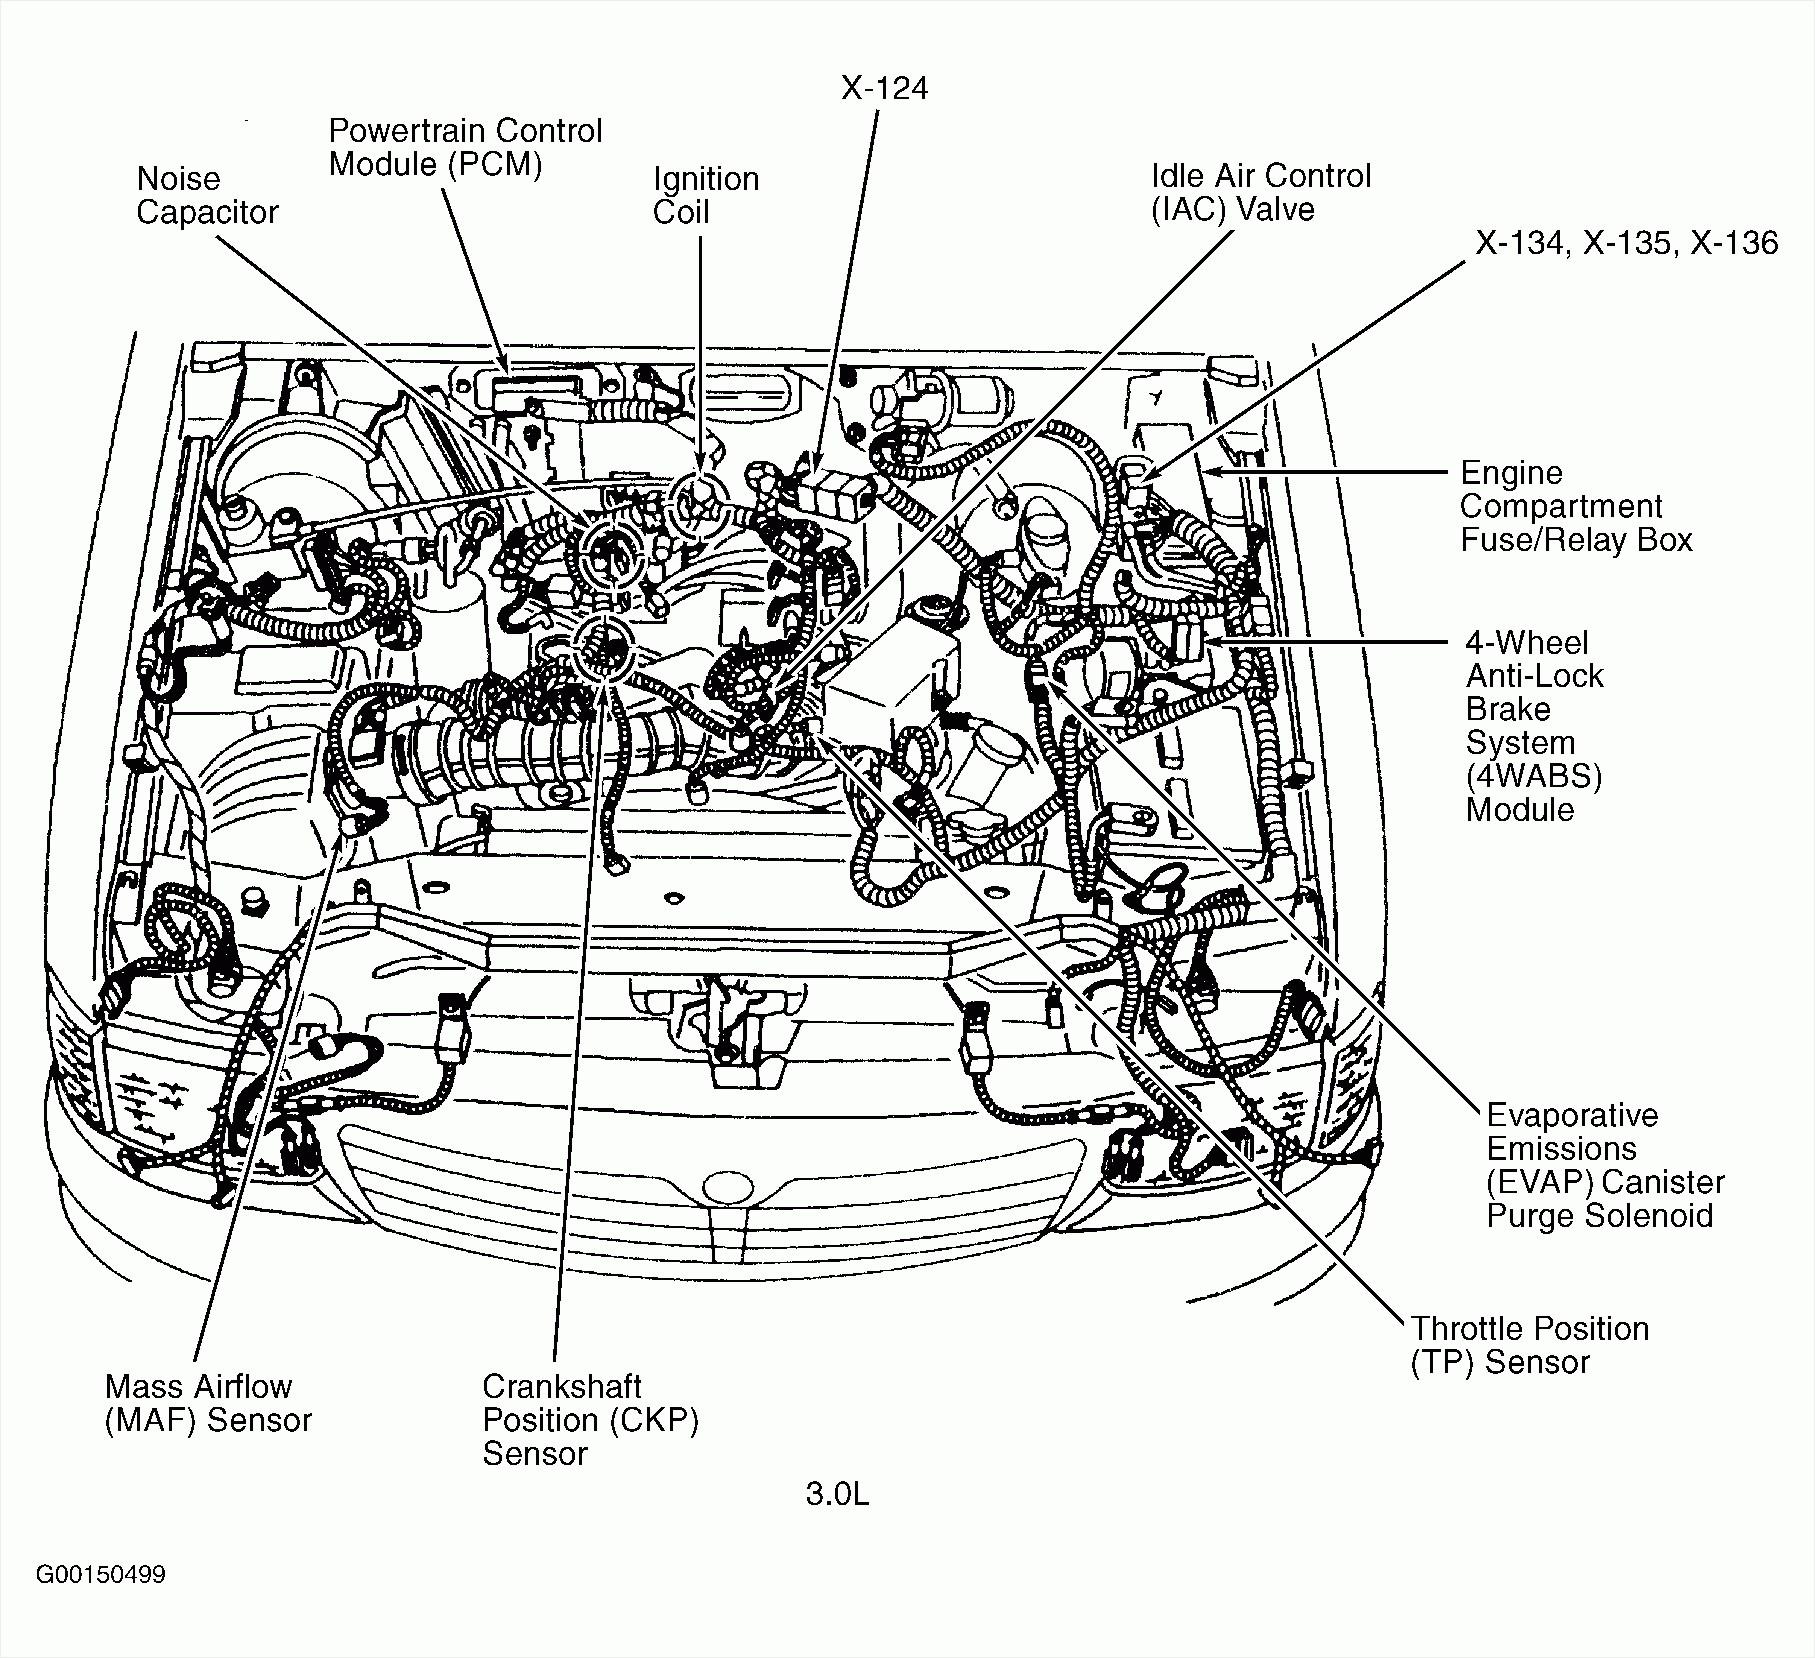 2004 mazda rx 8 engine diagram 9 9 ulrich temme de \u2022mazda rx8 wiring diagram best part of wiring diagram rh k12 aluminiumsolutions co 2005 mazda rx 8 engine diagram 2004 mazda 6 engine diagram